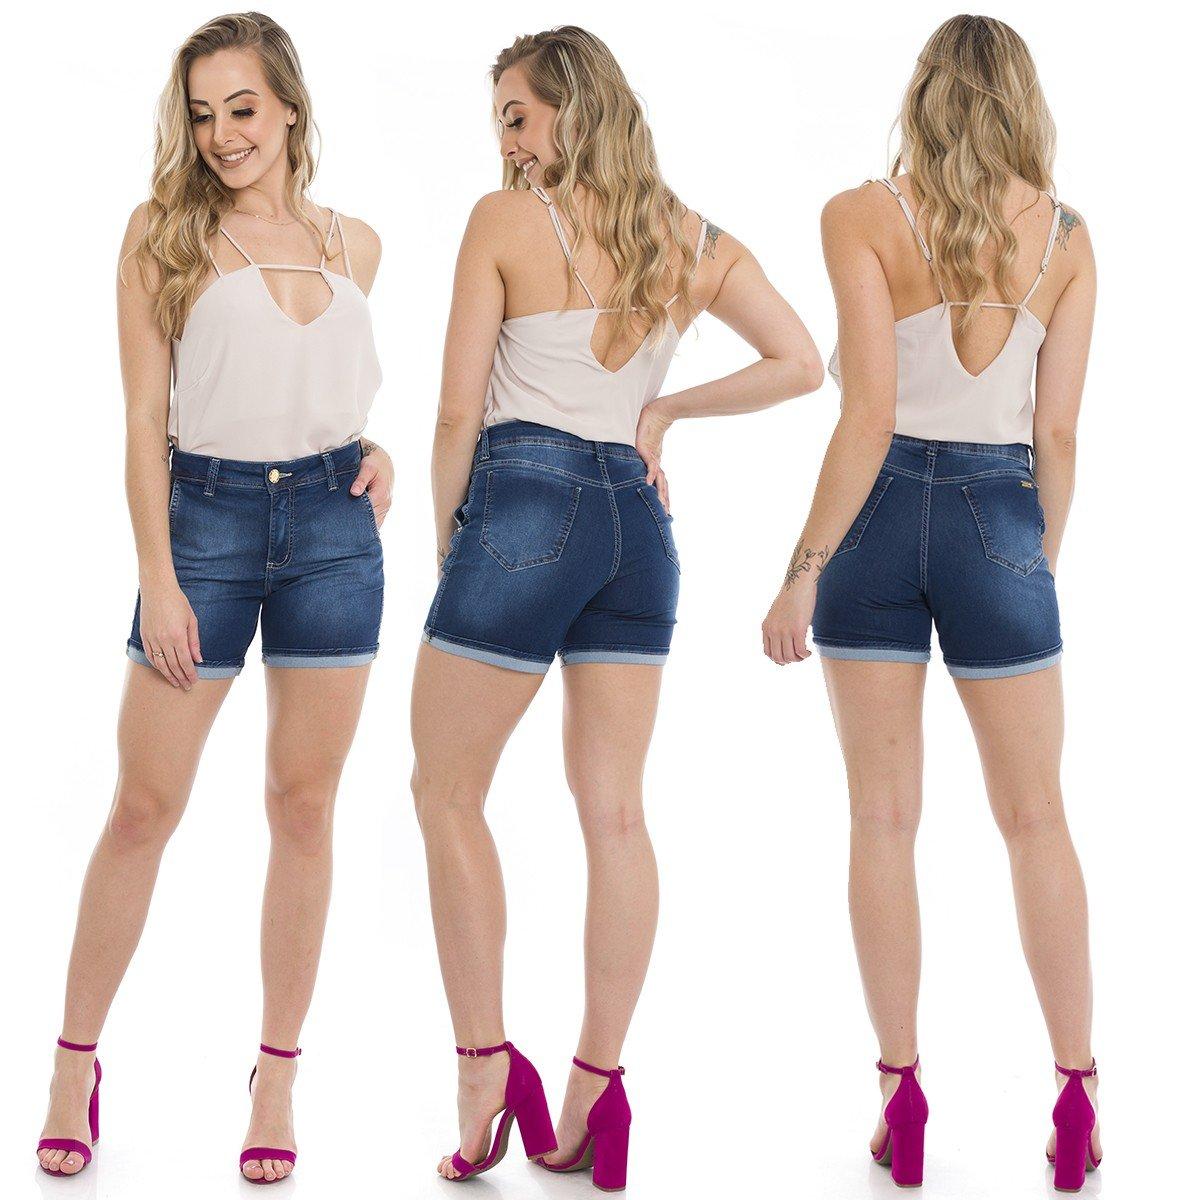 1512002 Bermuda Meia Coxa Jeans Barra Italiana (Completa)